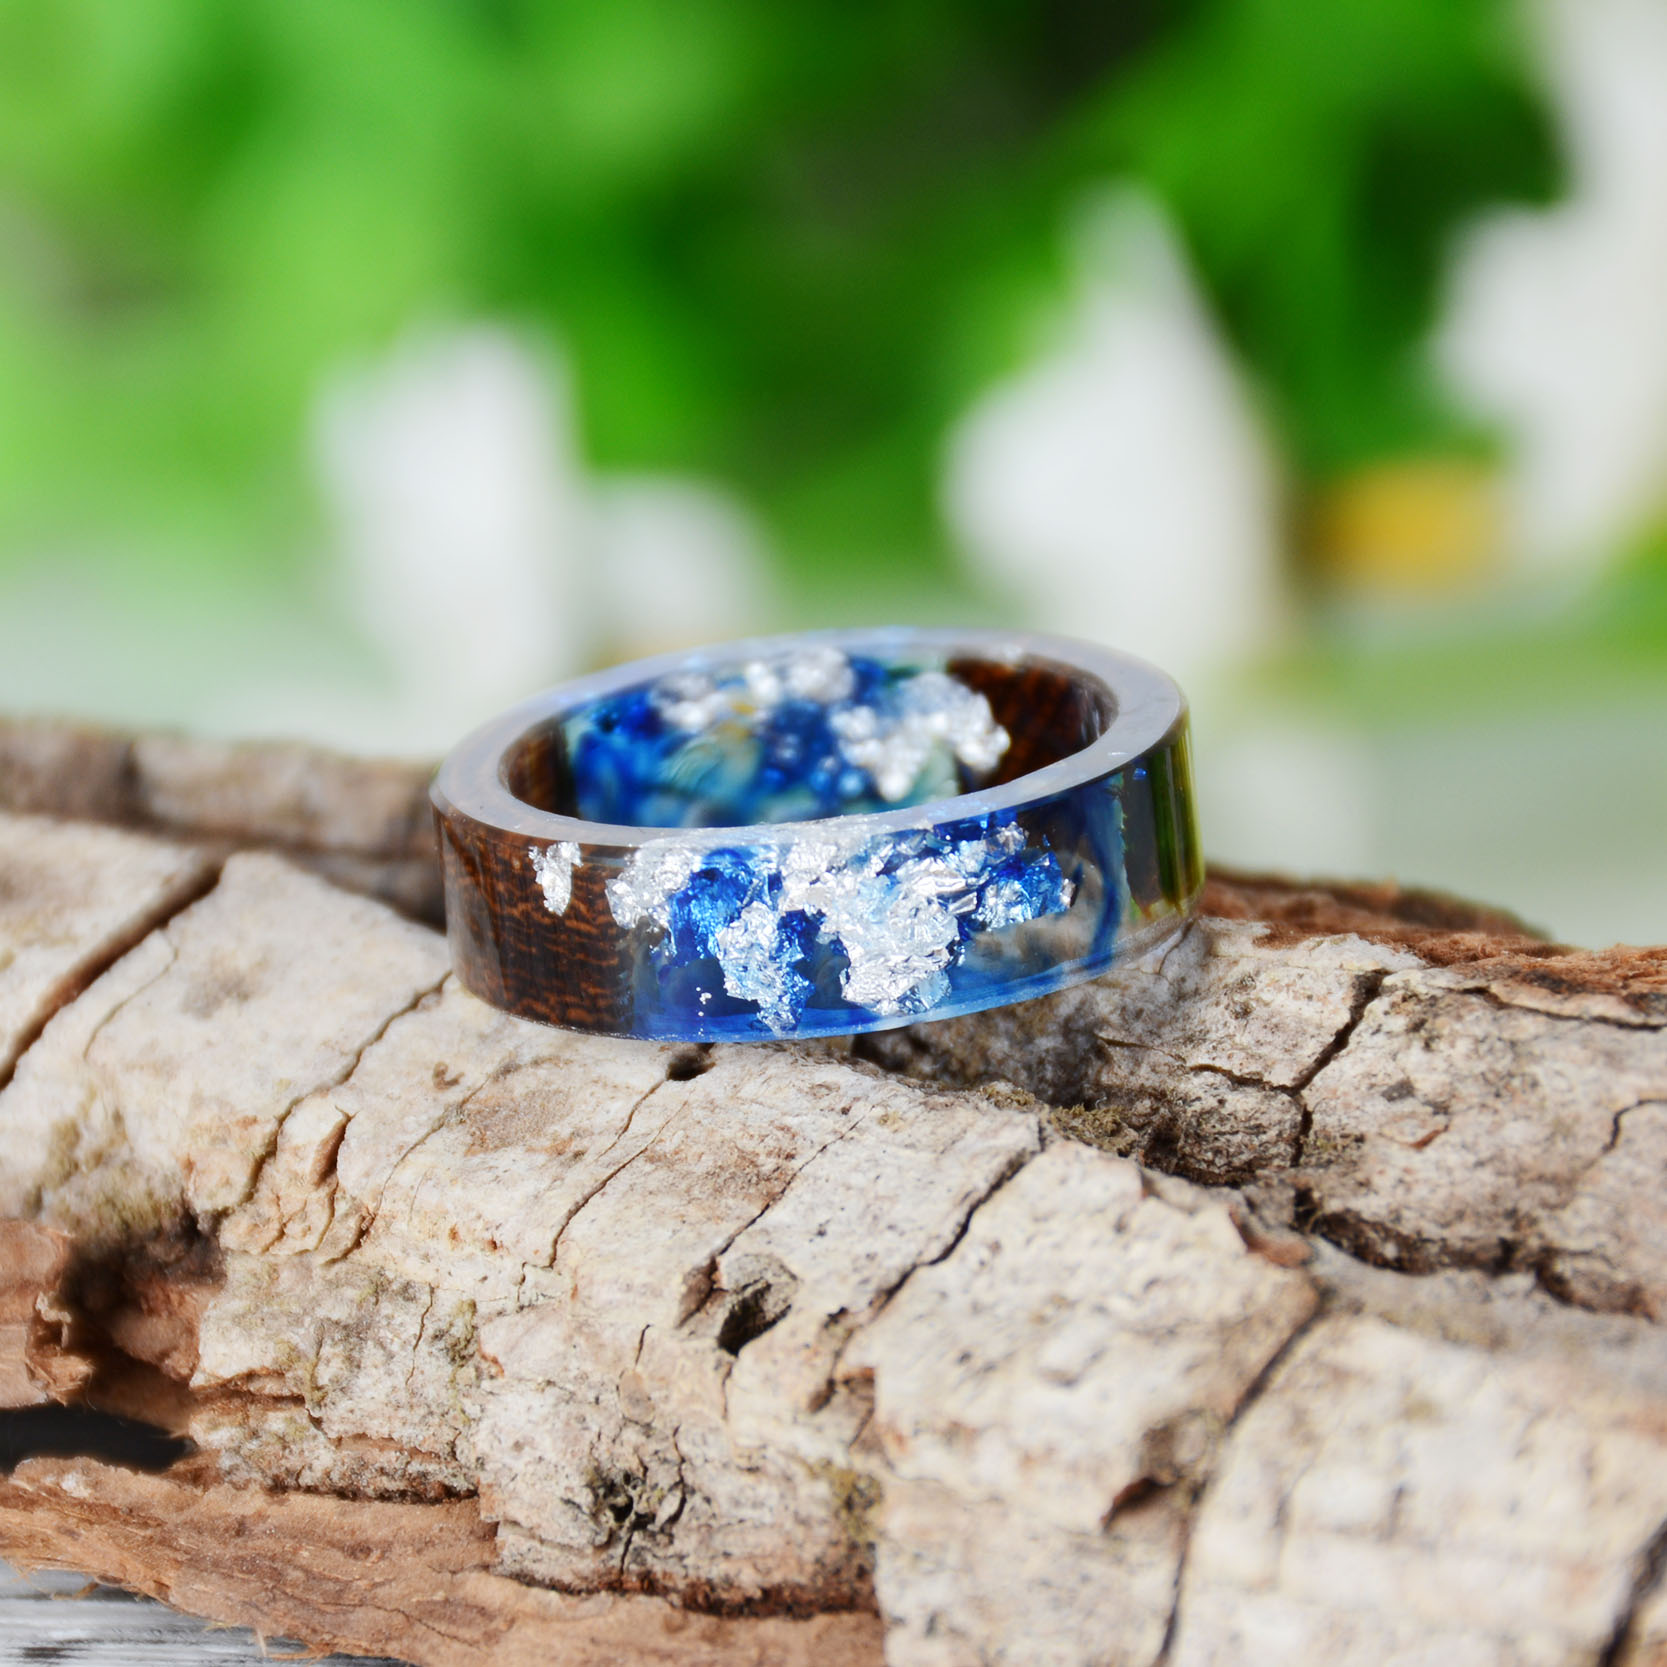 Clear Wood Resin Ring Handmade Dried Flower Hand Jewellery 19